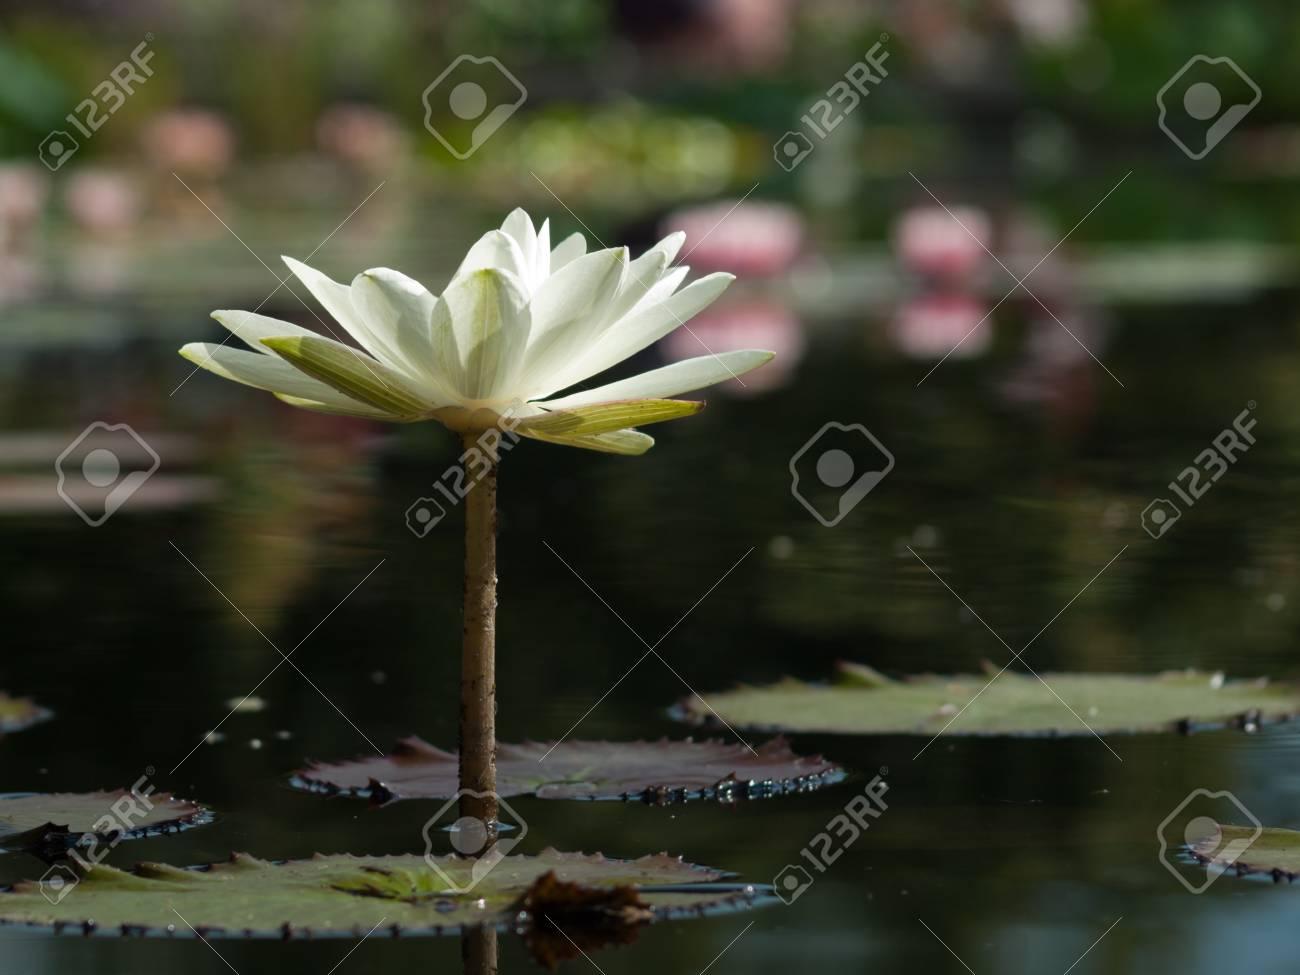 Nenuphar Innocence L Innocence Est Une Fleur De Lys Blanche